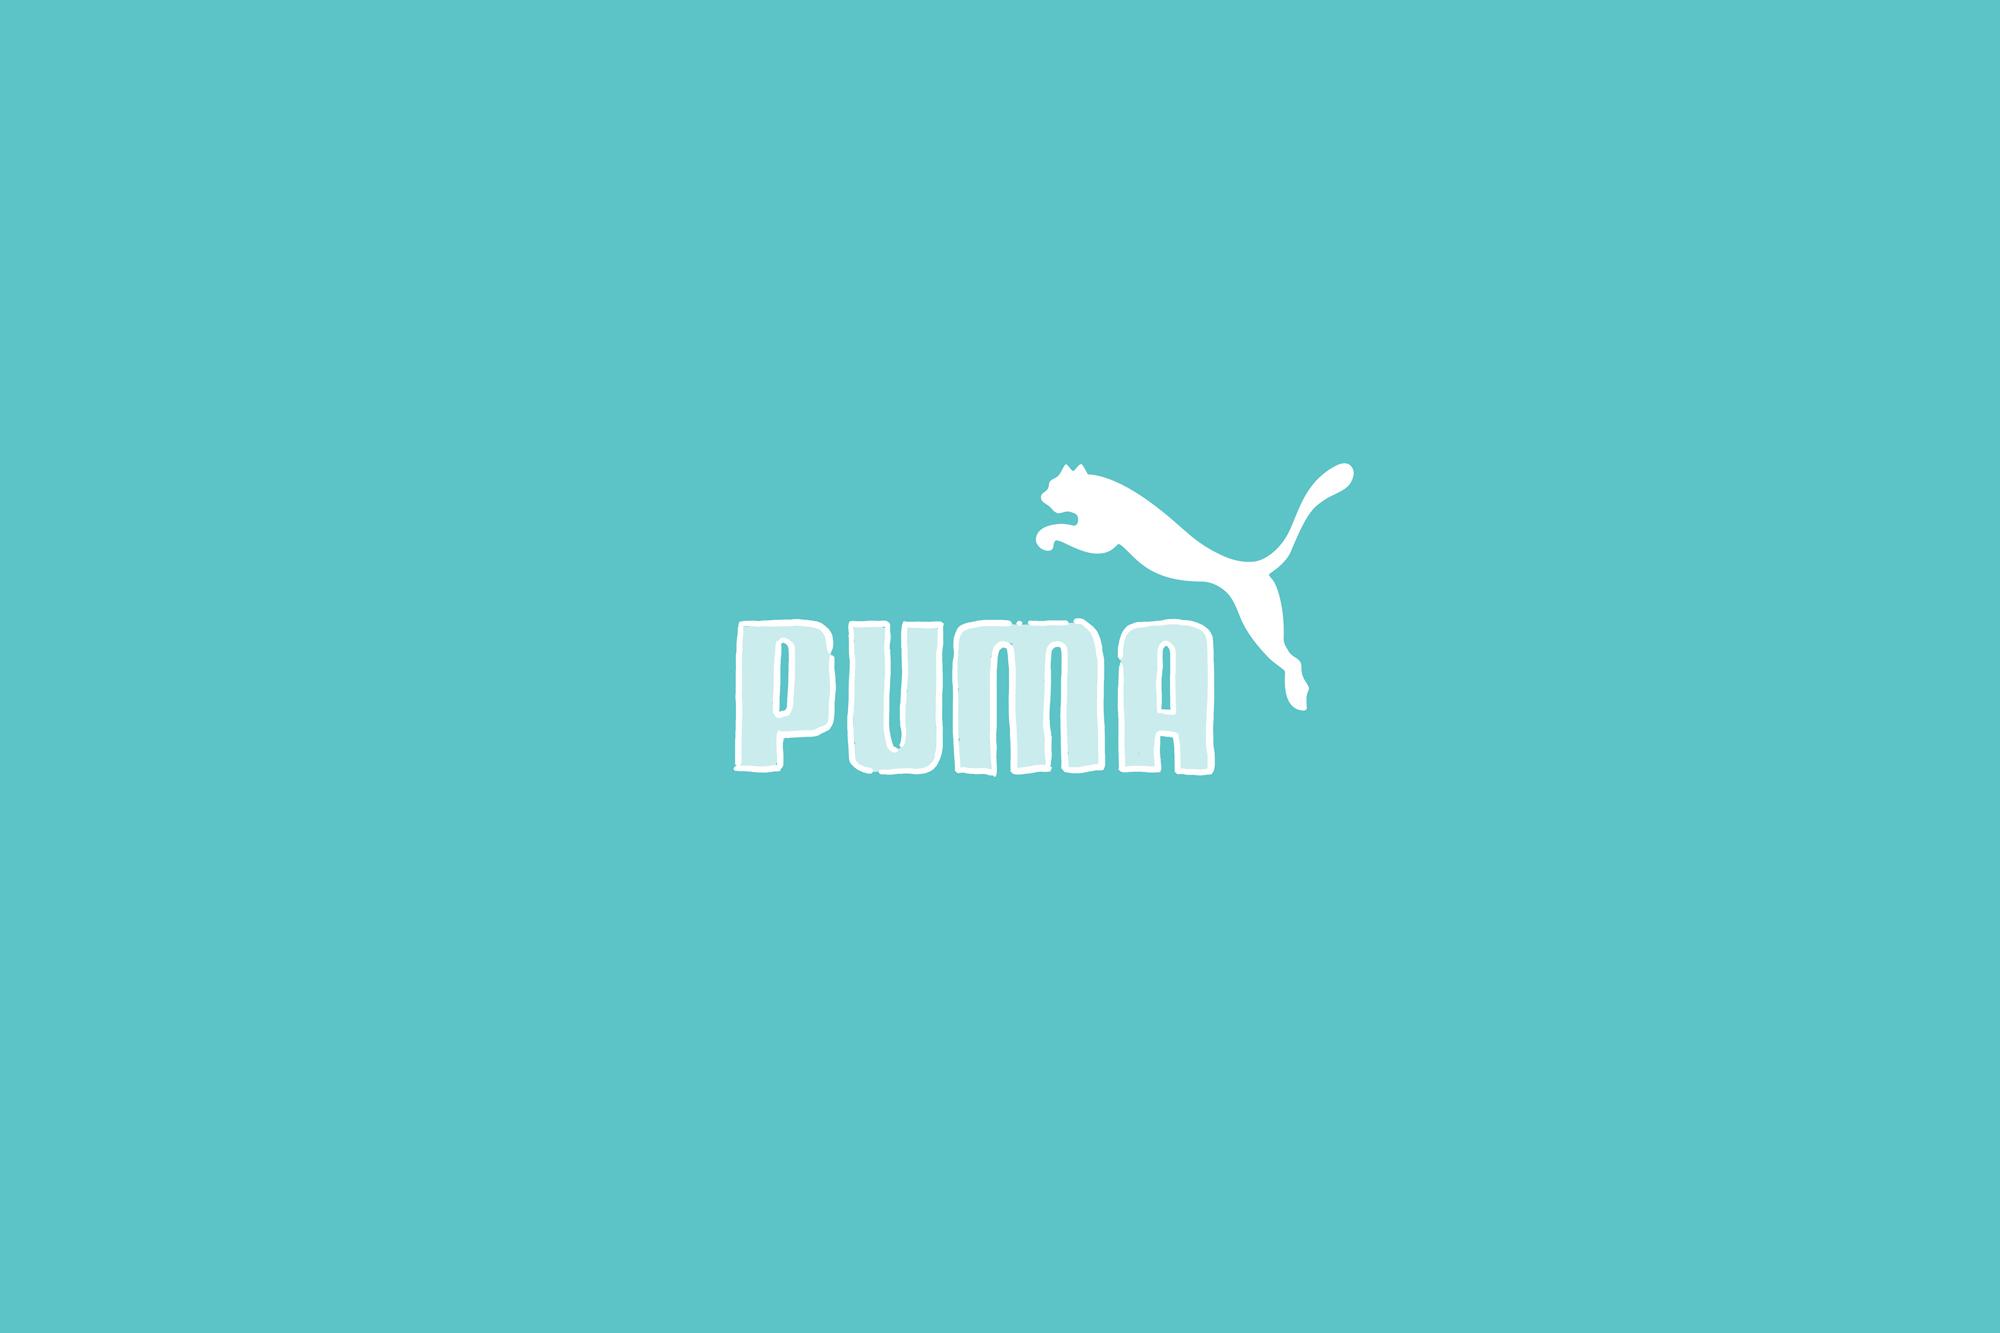 Puma takes New York